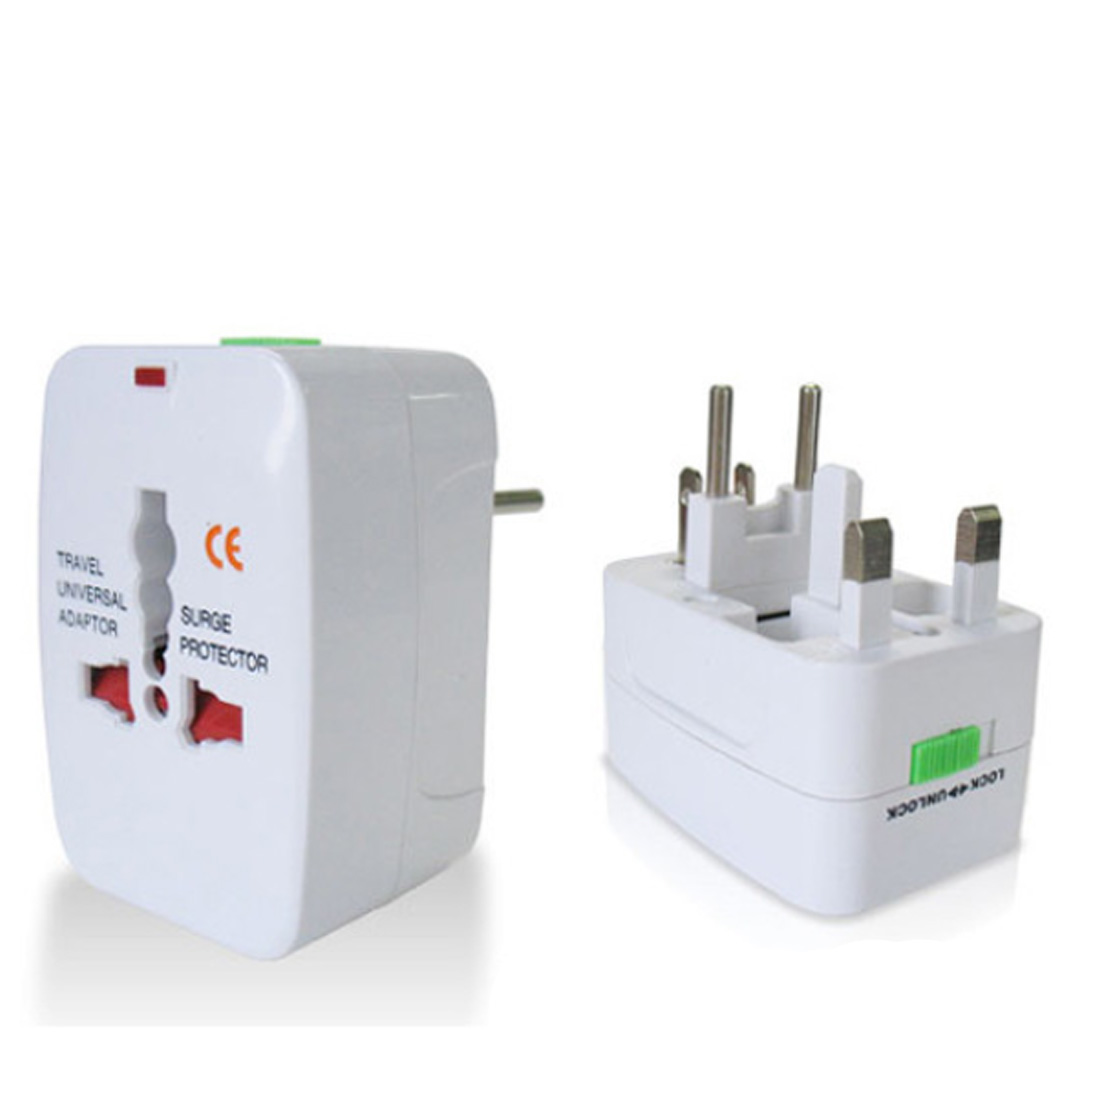 MAIF Hot Sale All in One Universal International Power Plug Adapter Port World Travel